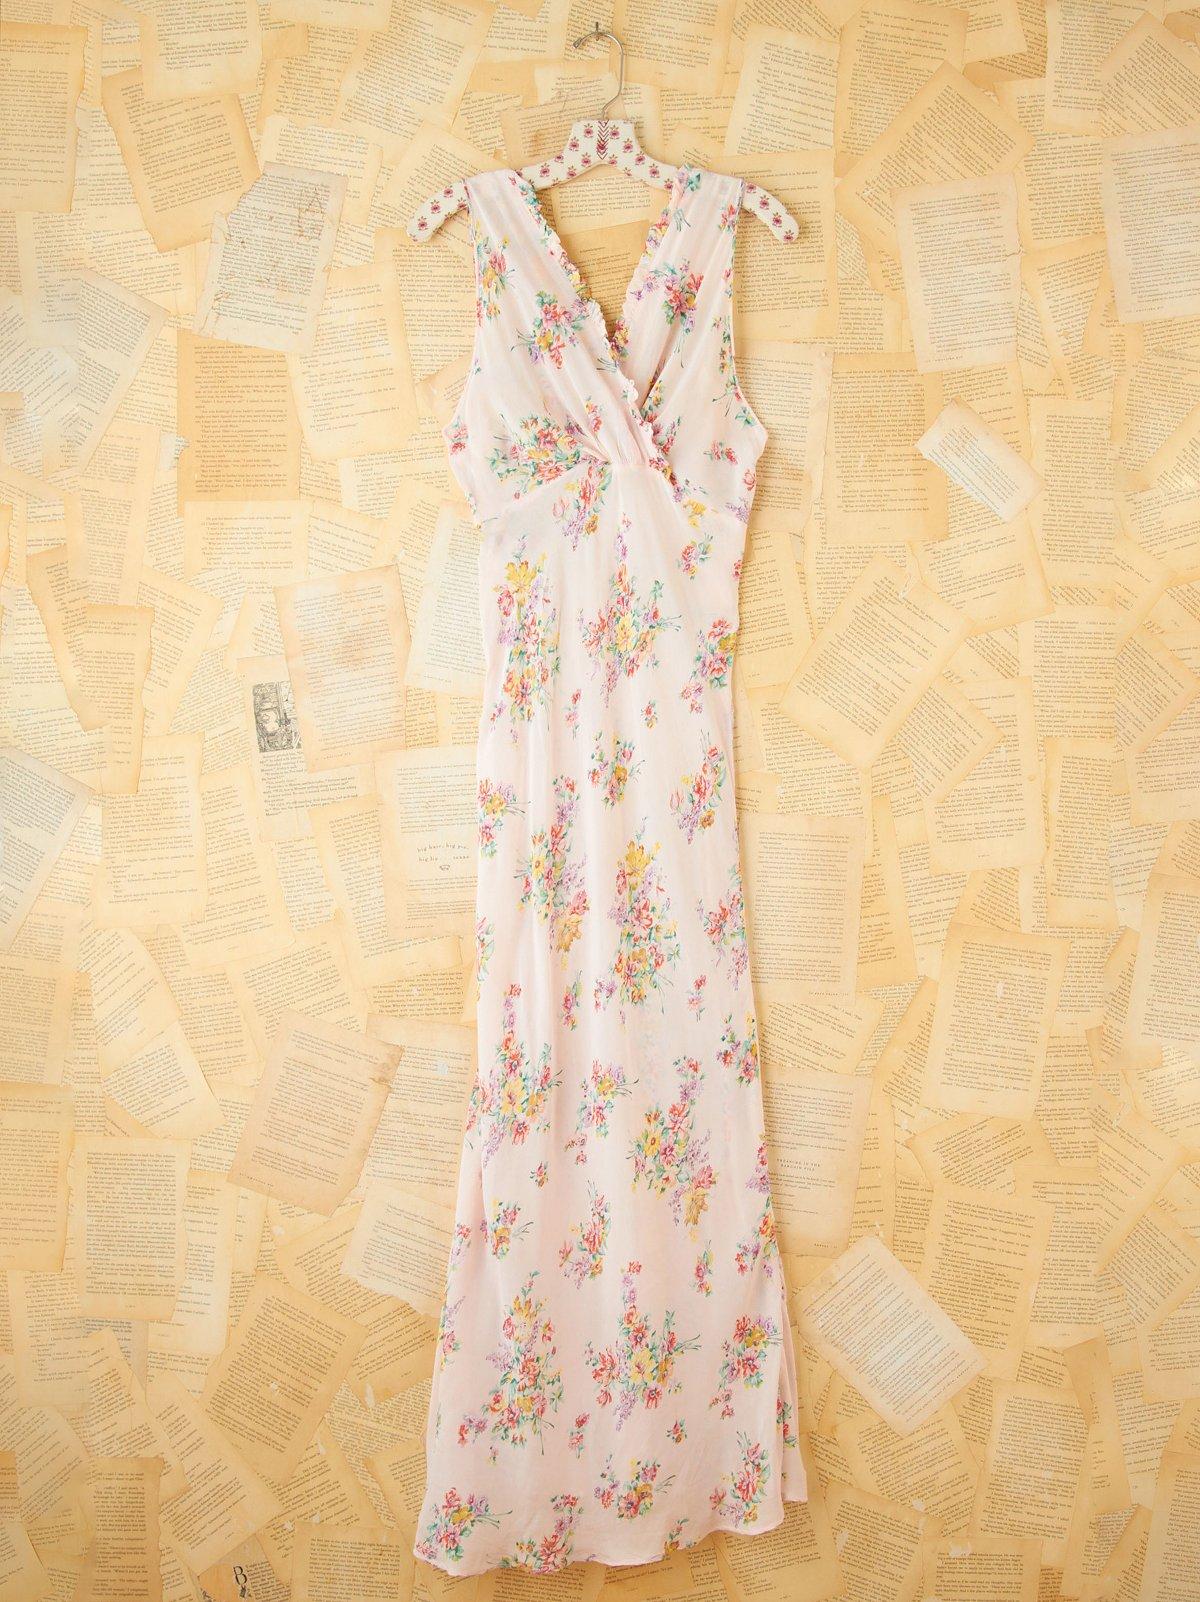 Vintage Floral Printed Slip Dress